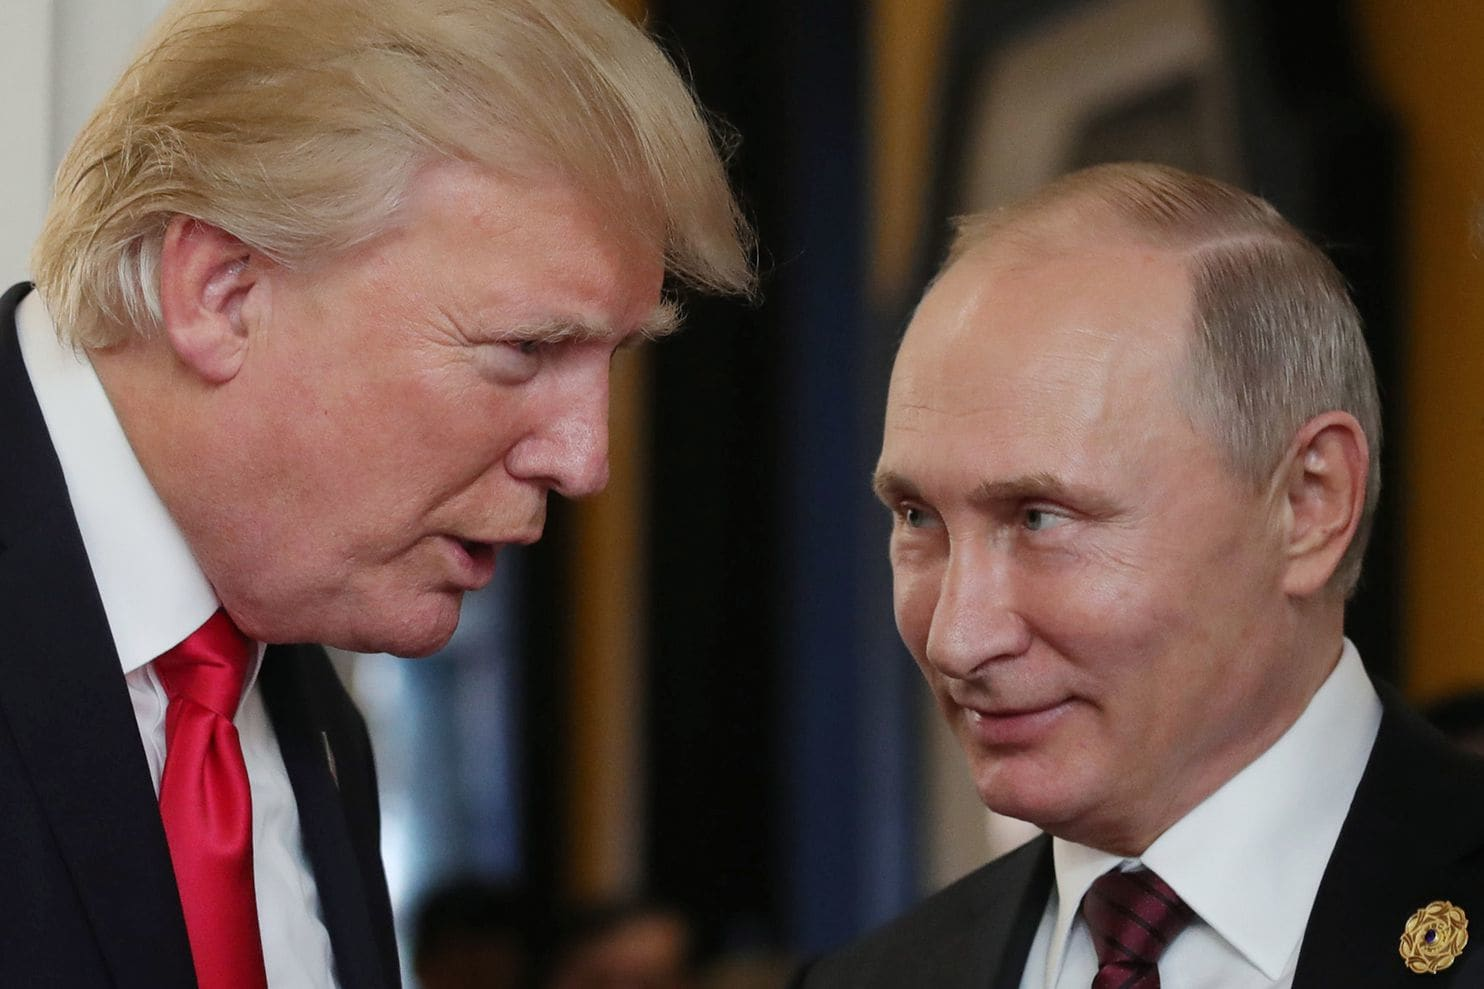 Trump Tweets That Russia Helped Him Win The Election (True) Then Walks It Back